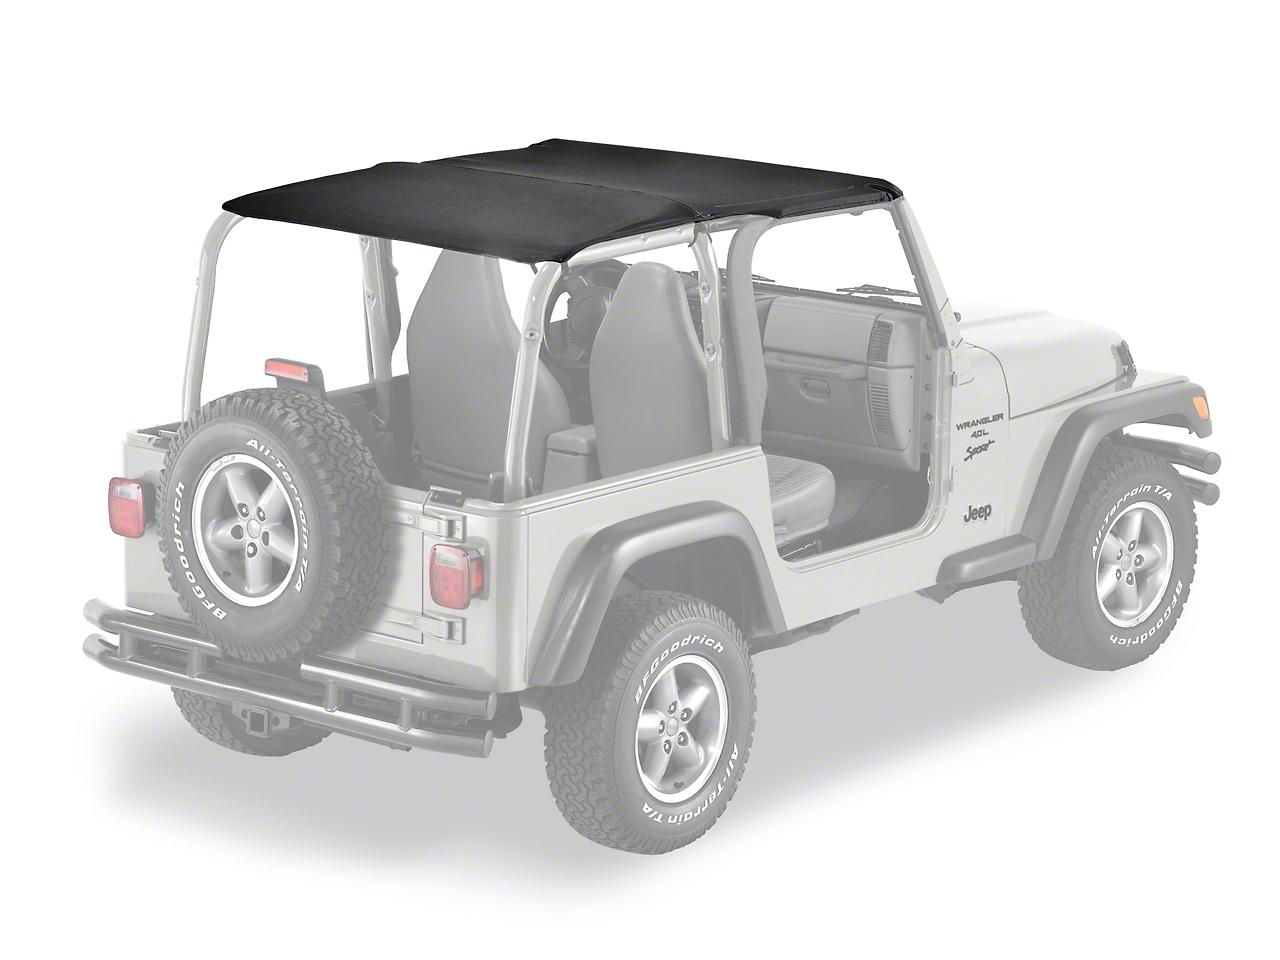 Bestop Safari-Style Header Bikini Top - Black Denim (97-02 Jeep Wrangler TJ)